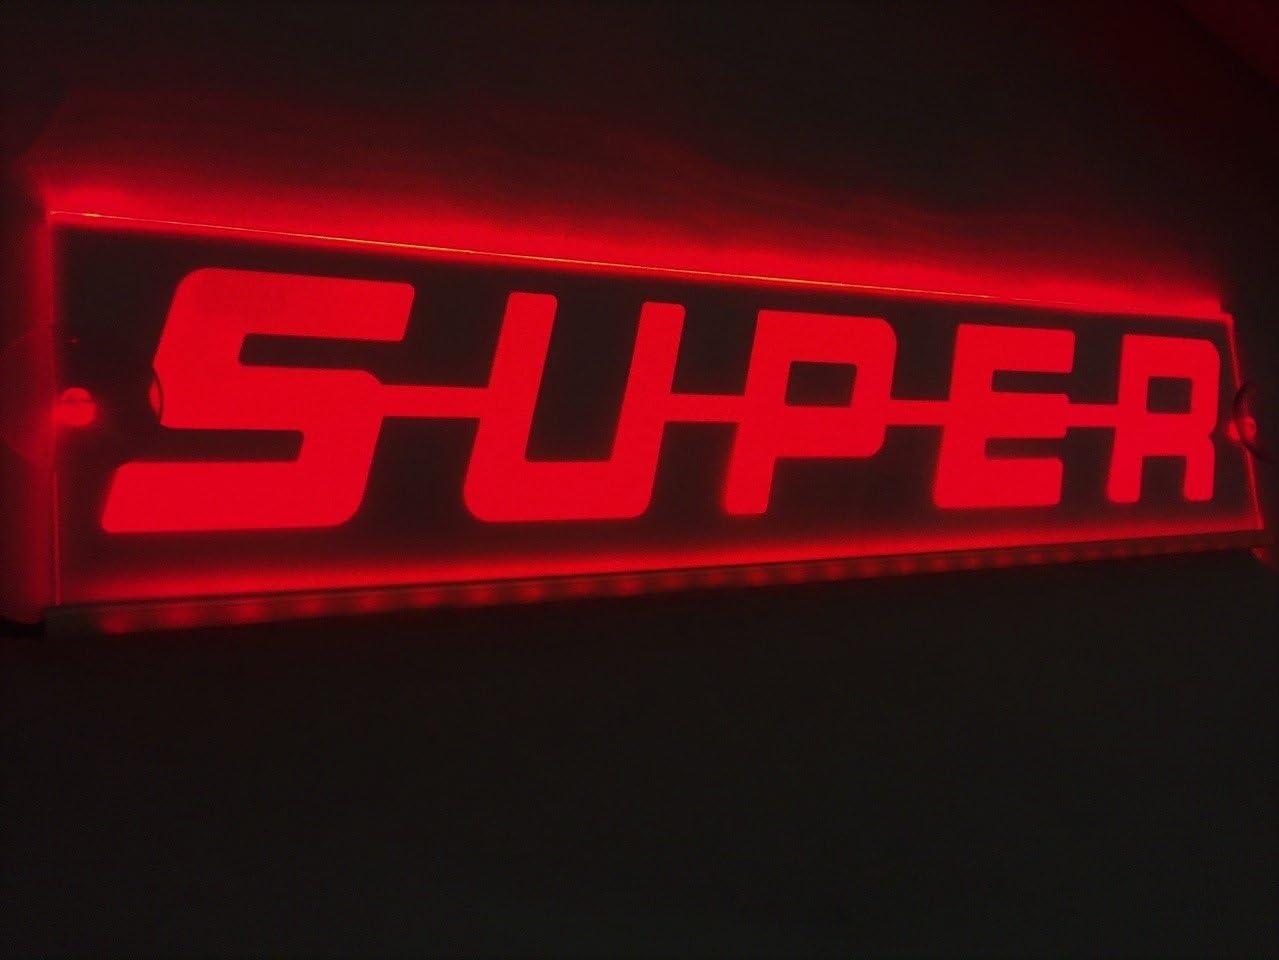 Placa LED iluminadora de 24 V roja Super se/ñal luz para Scania camiones cabina decoraci/ón interior 500 mm